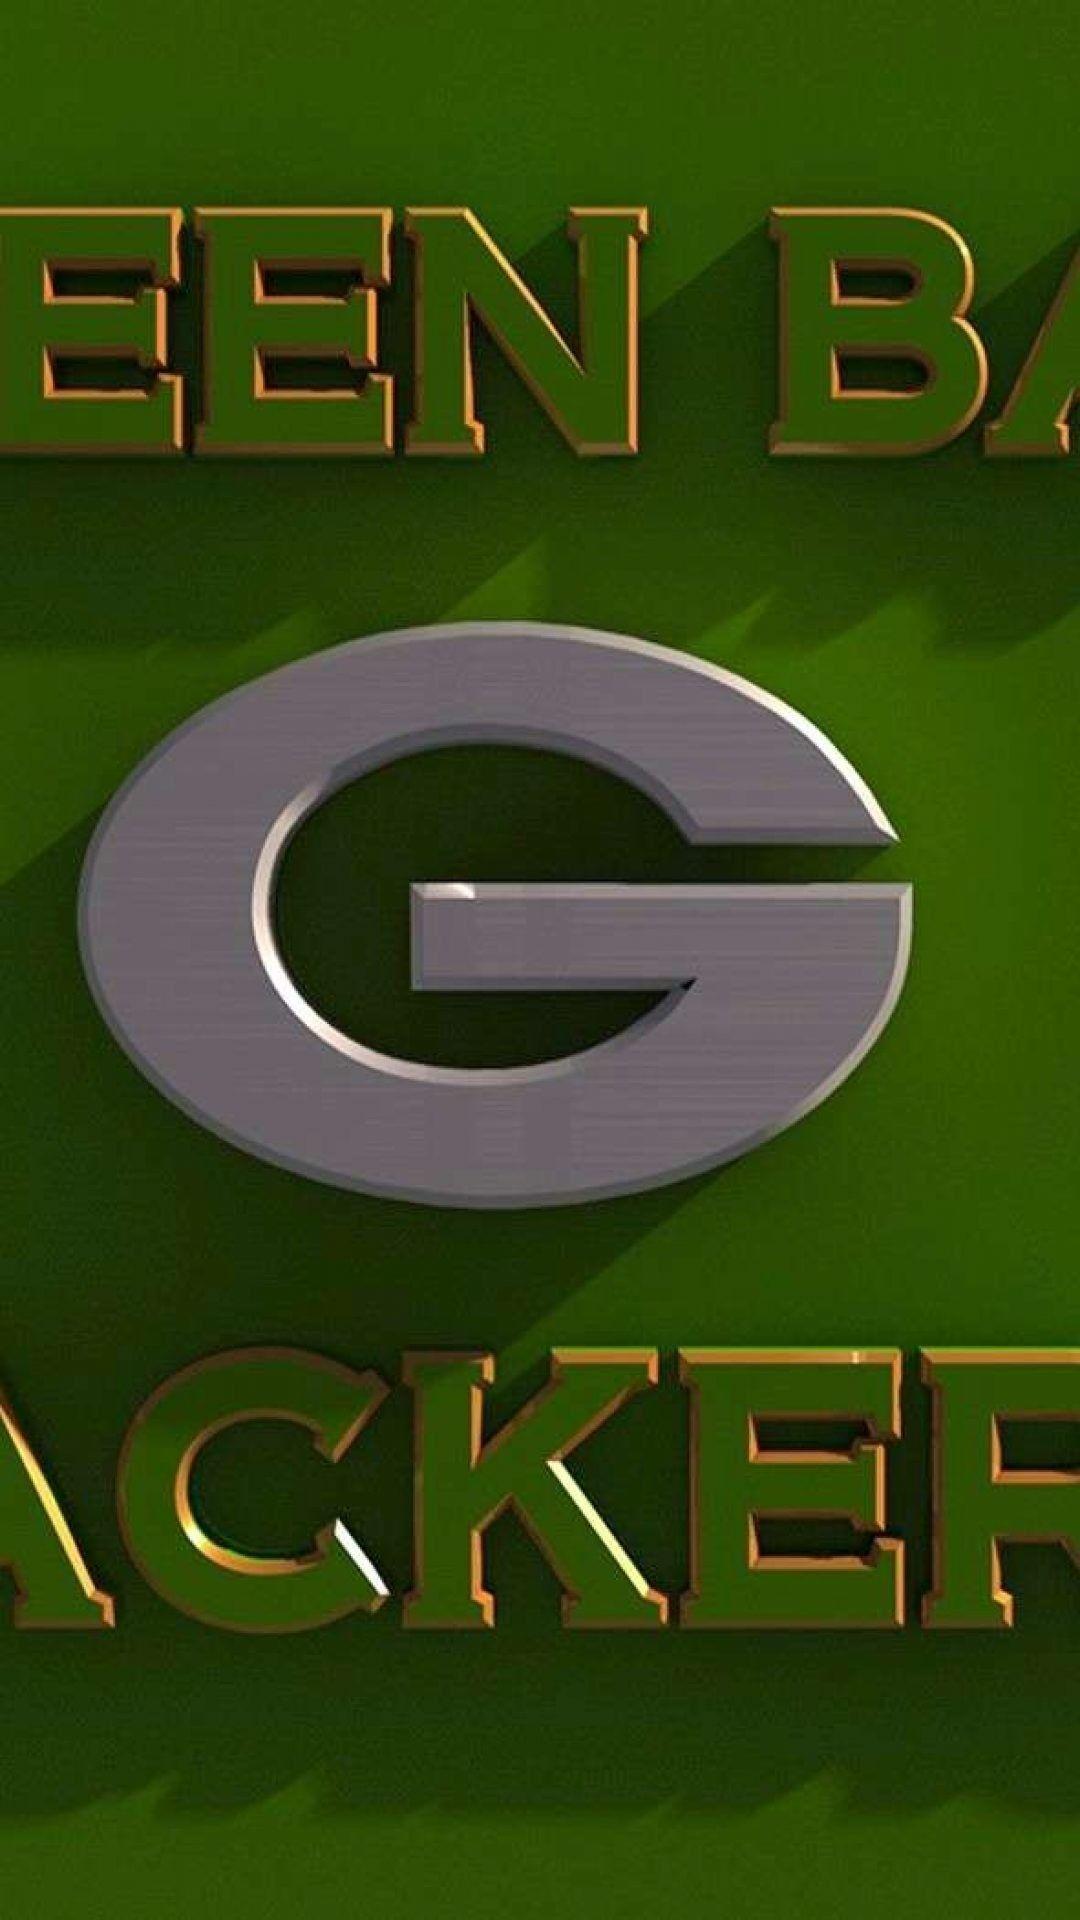 Logo Green Bay Packers Wallpaper Hd logo green bay